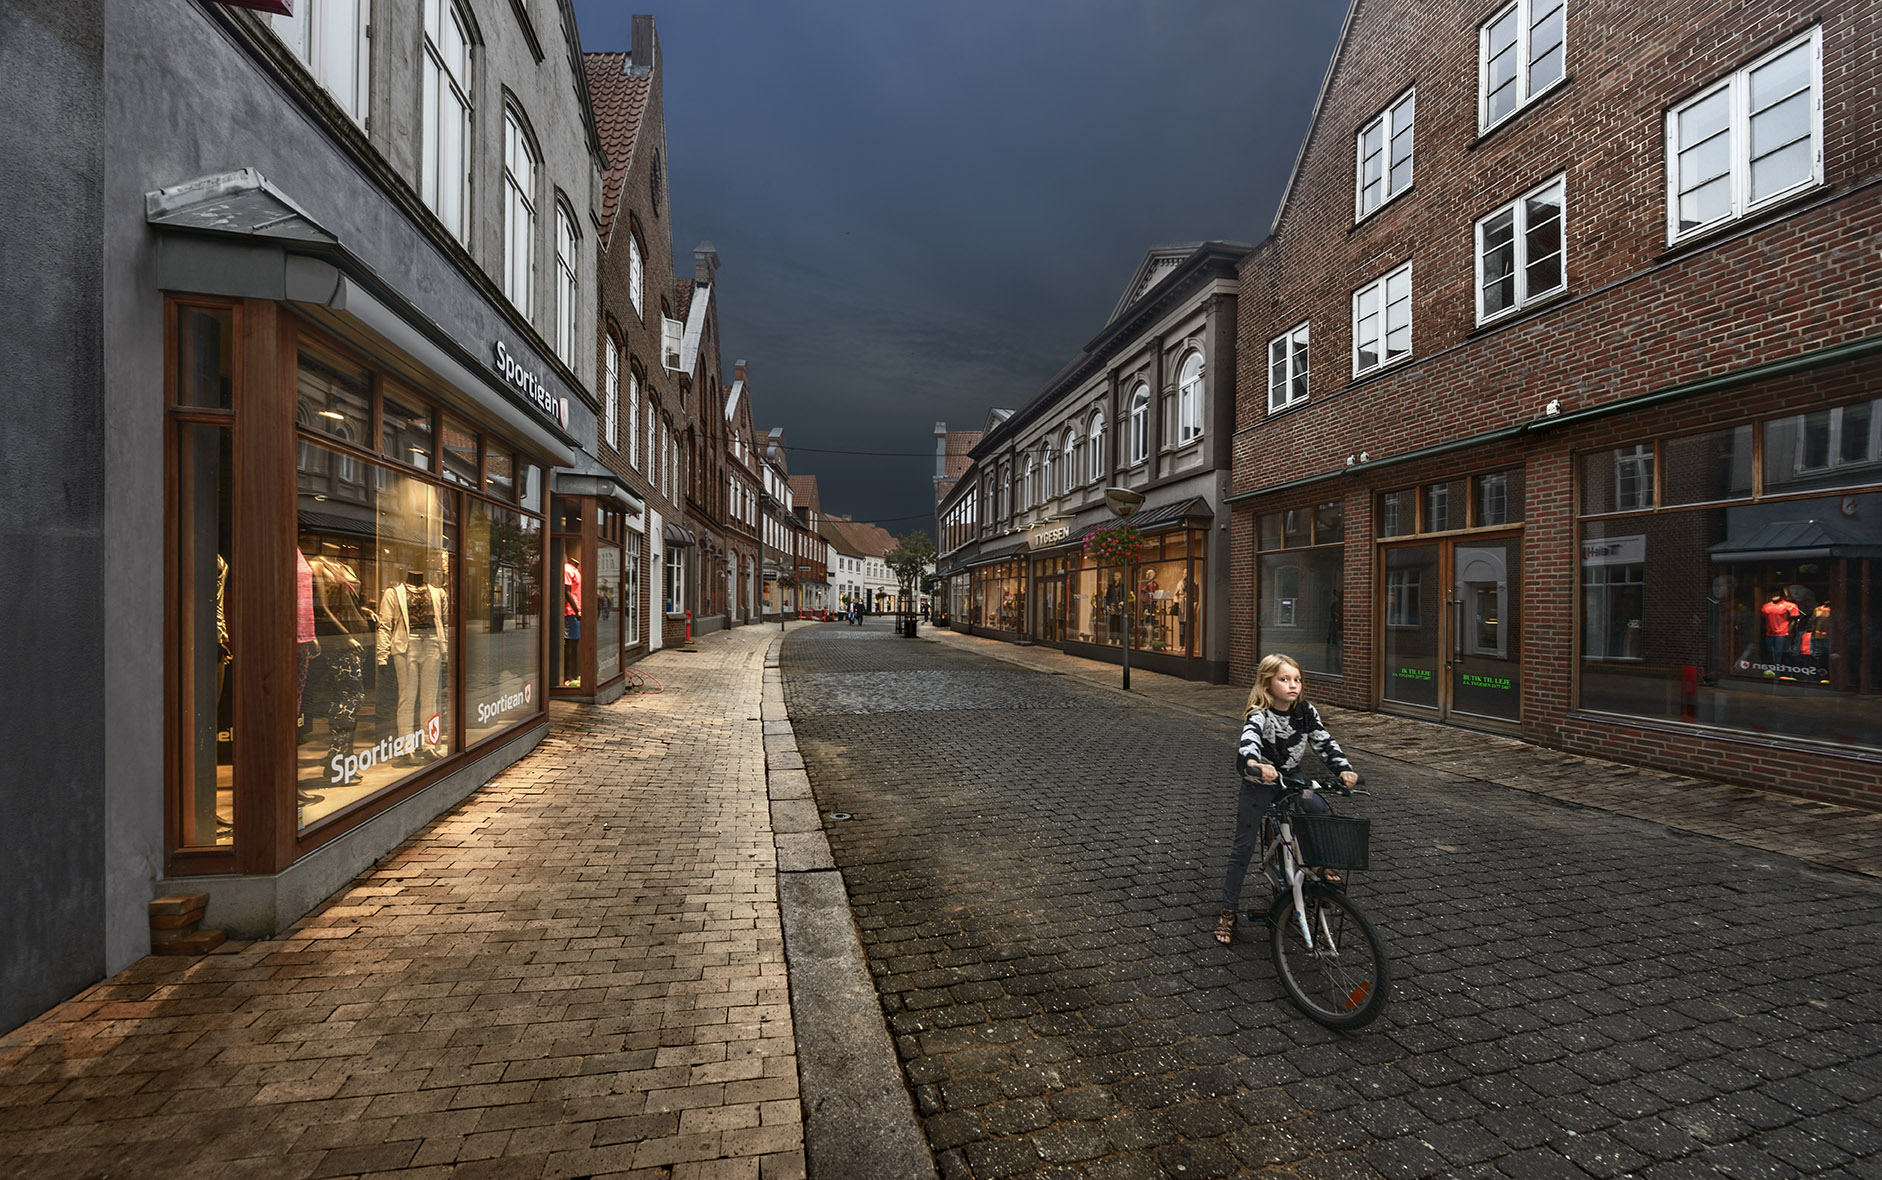 Small town romance (Tonder, Denmark)